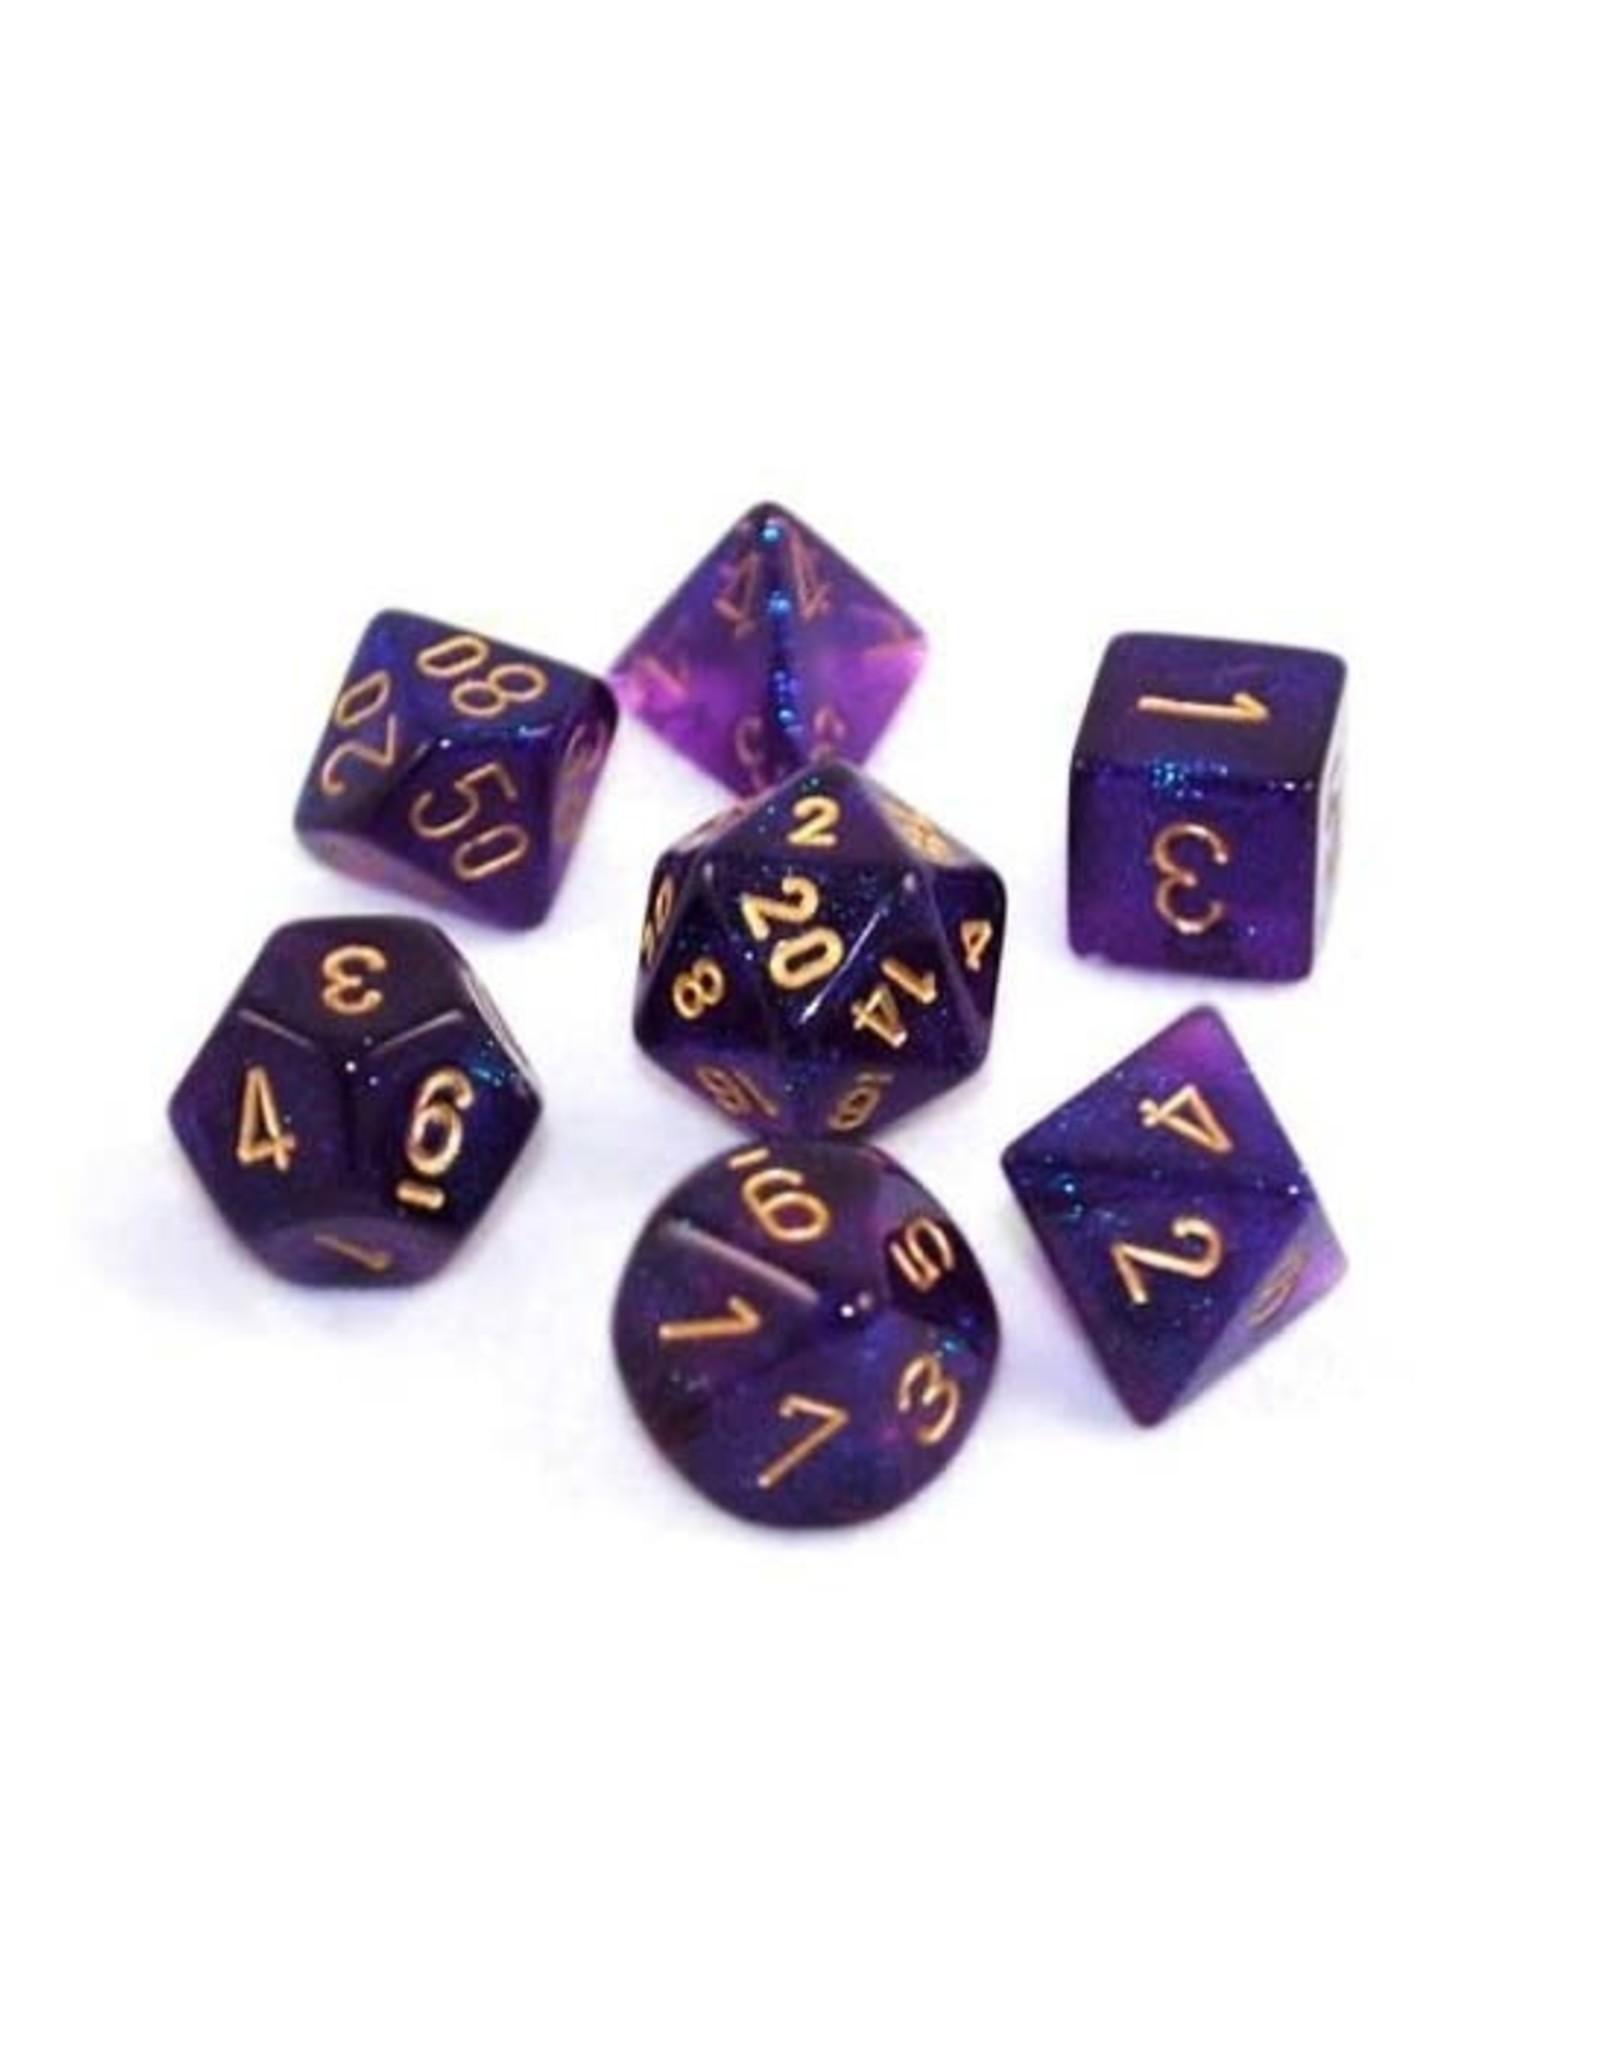 Chessex Chessex: Poly 7 Set - Borealis - Royal Purple w/ Gold